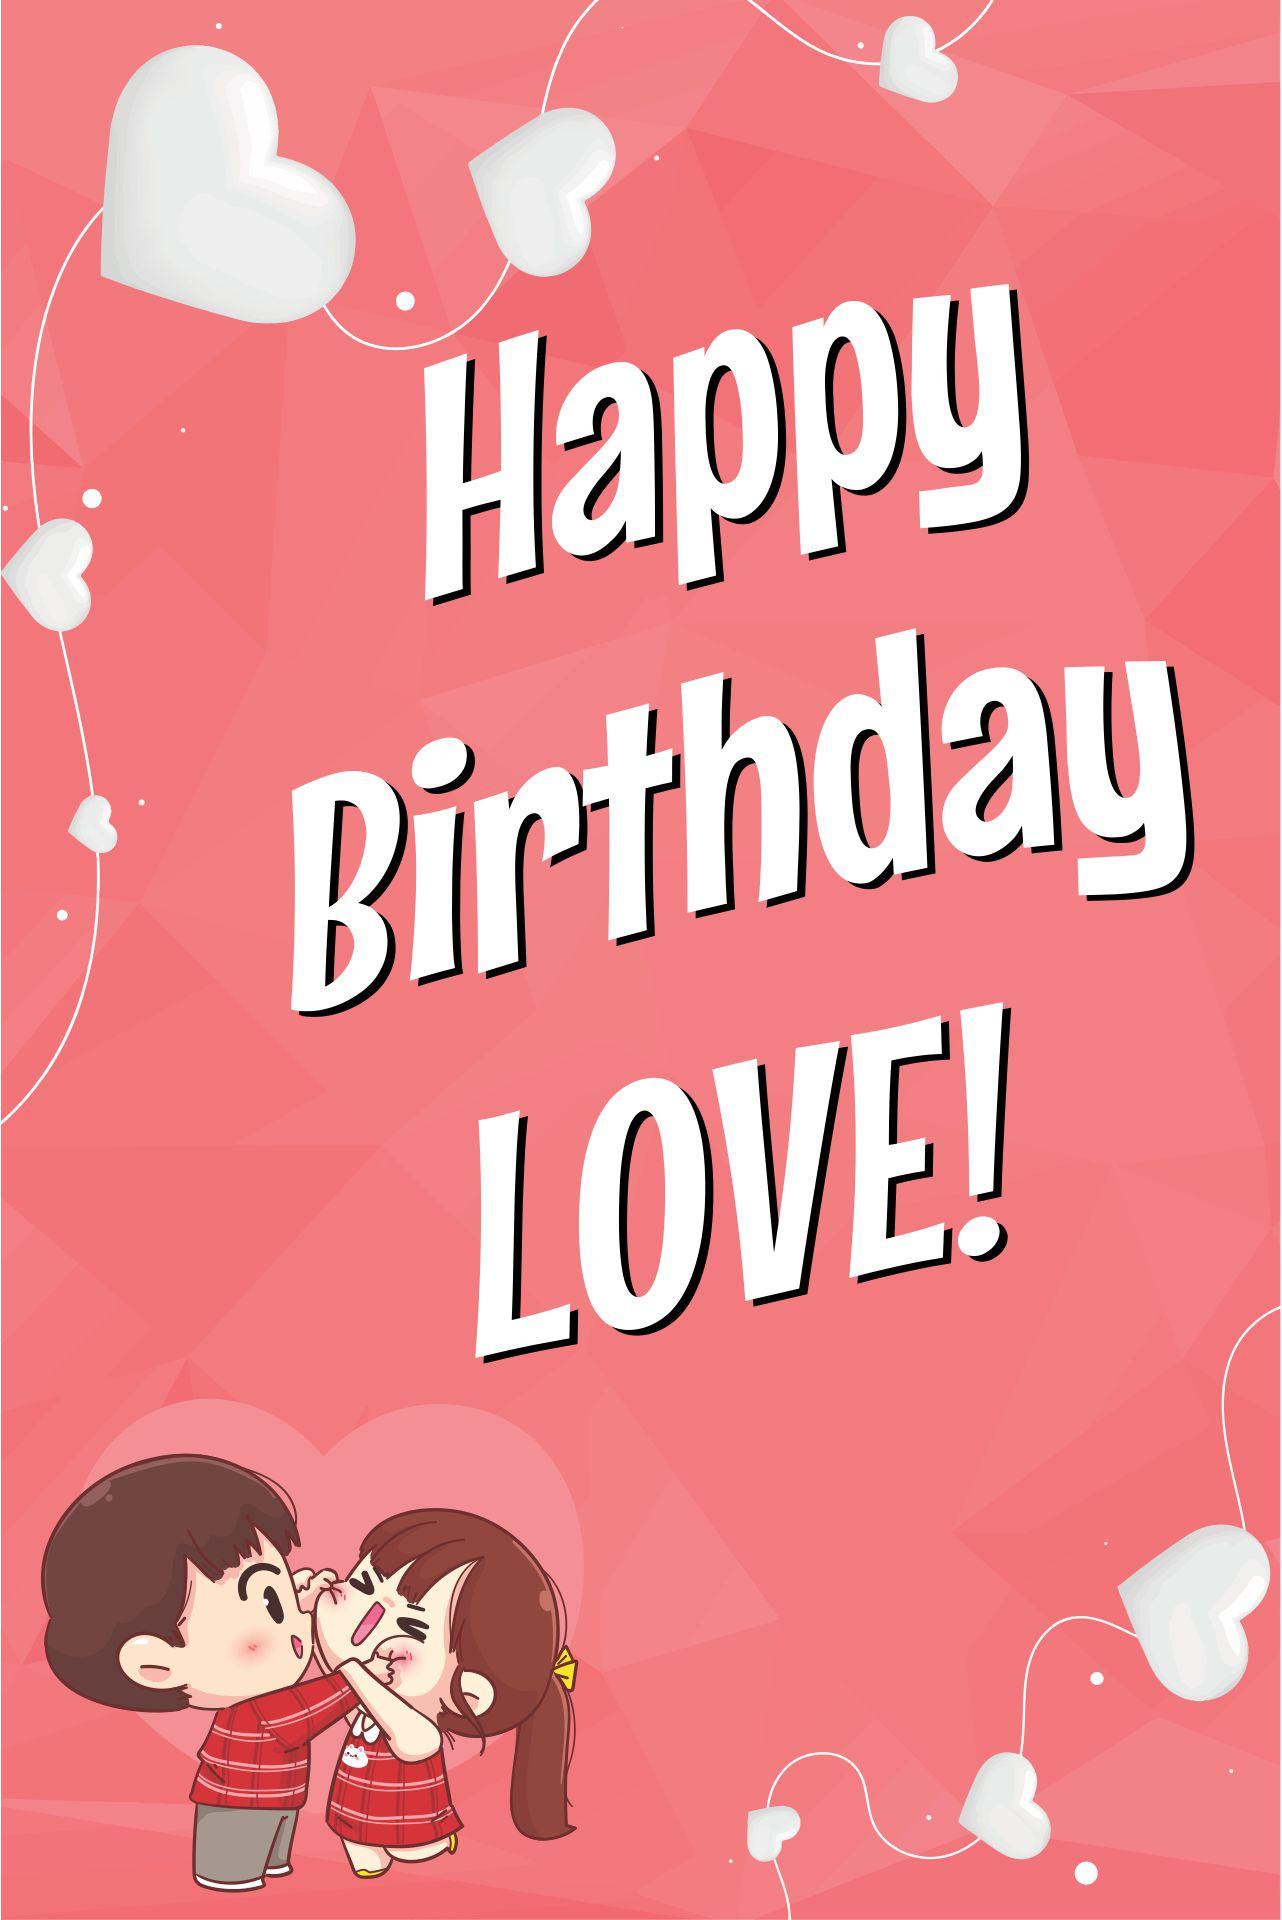 Birthday Cards For Him Romantic